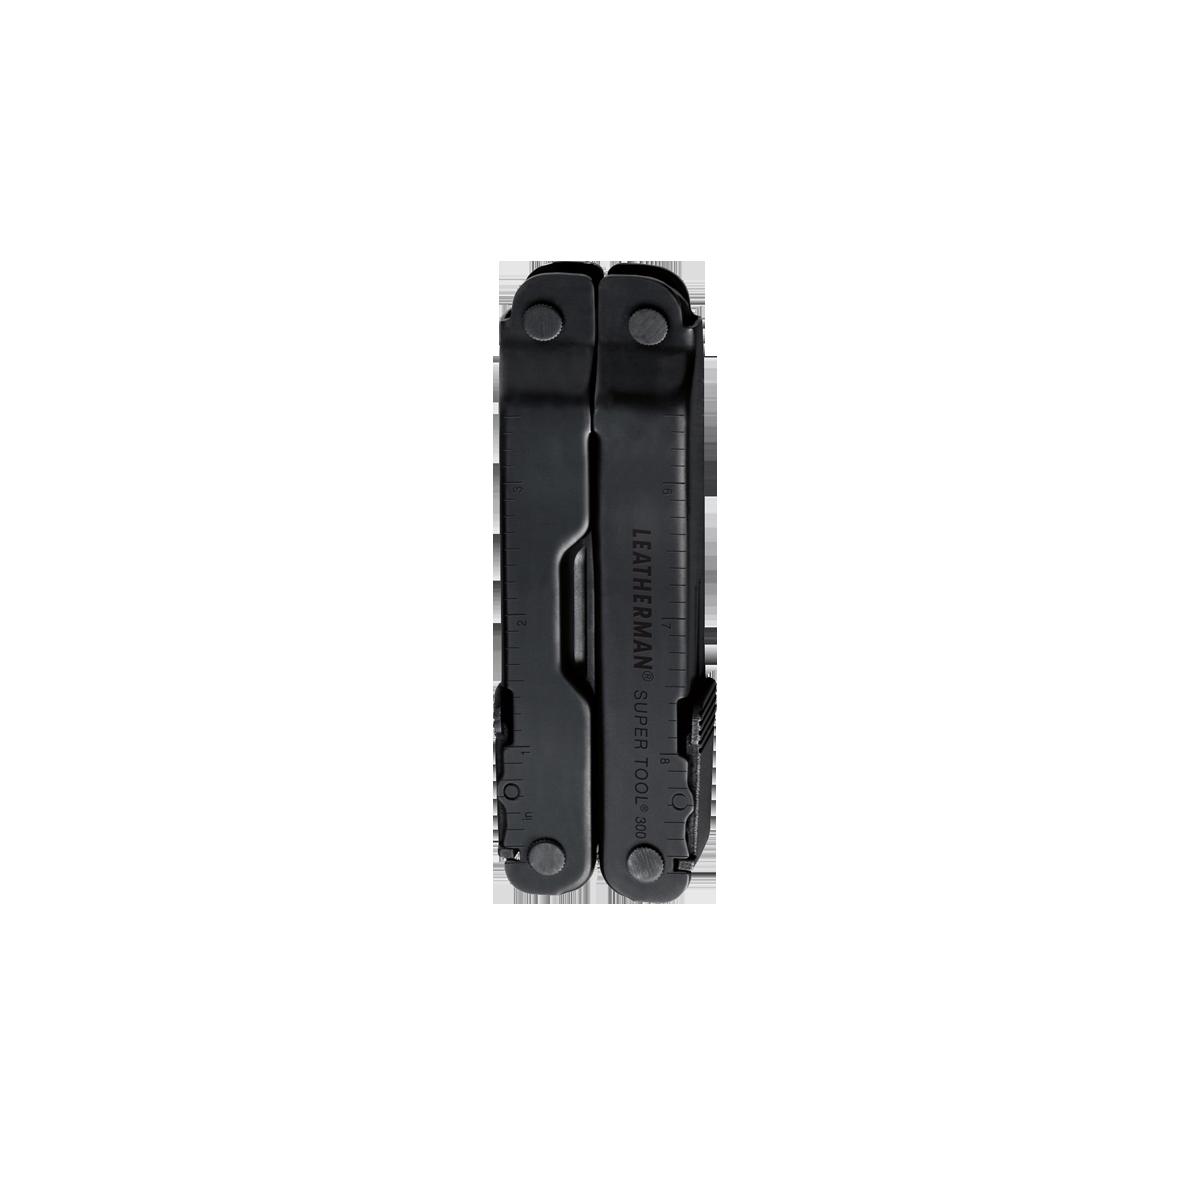 Leatherman super tool 300 multi-tool, black, closed view